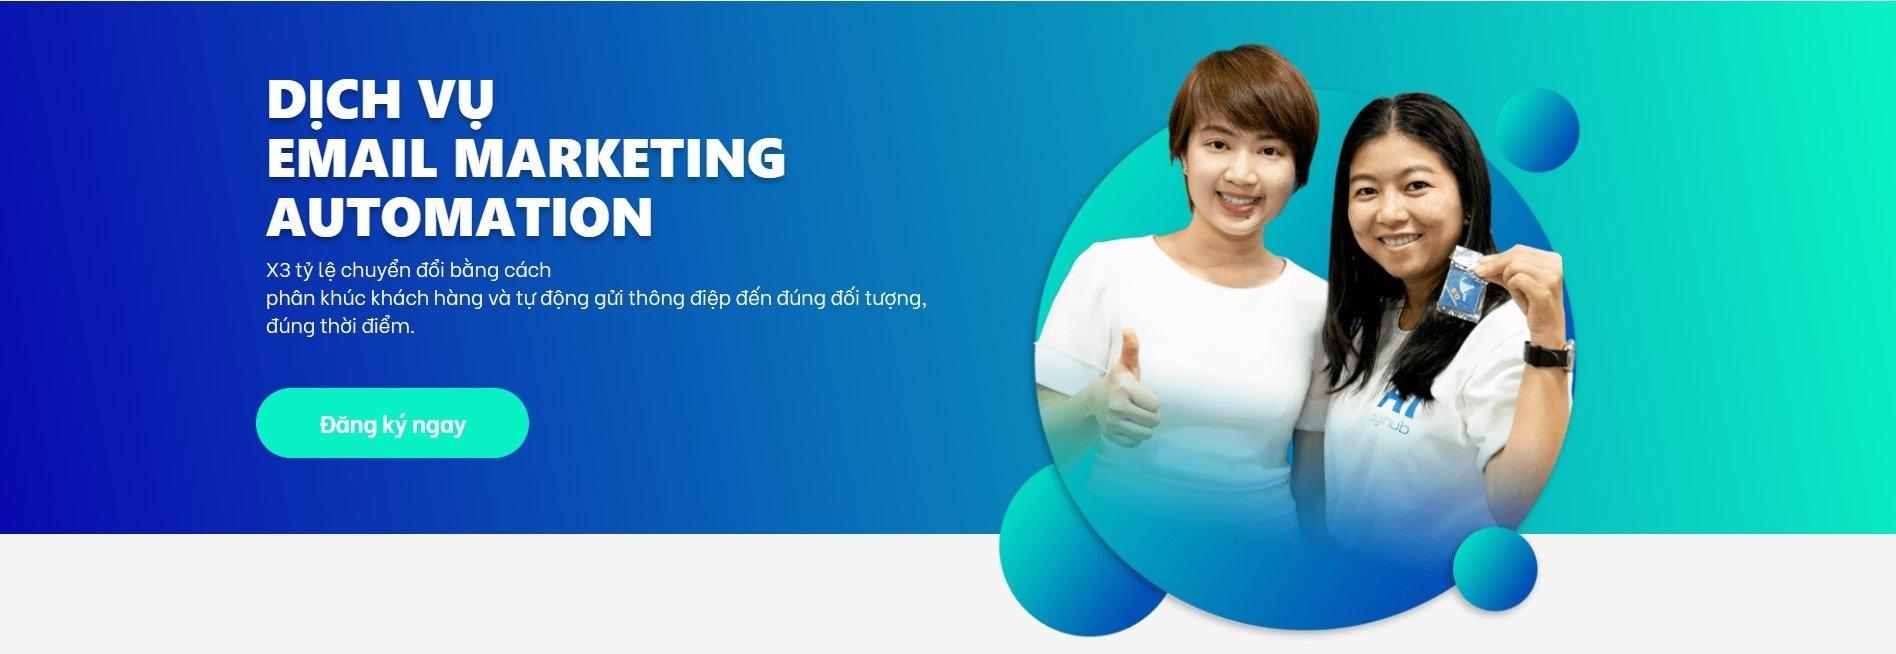 DichvuEmailMarketingFIEX Marketing (@dichvuemailmarketingfiex) Cover Image